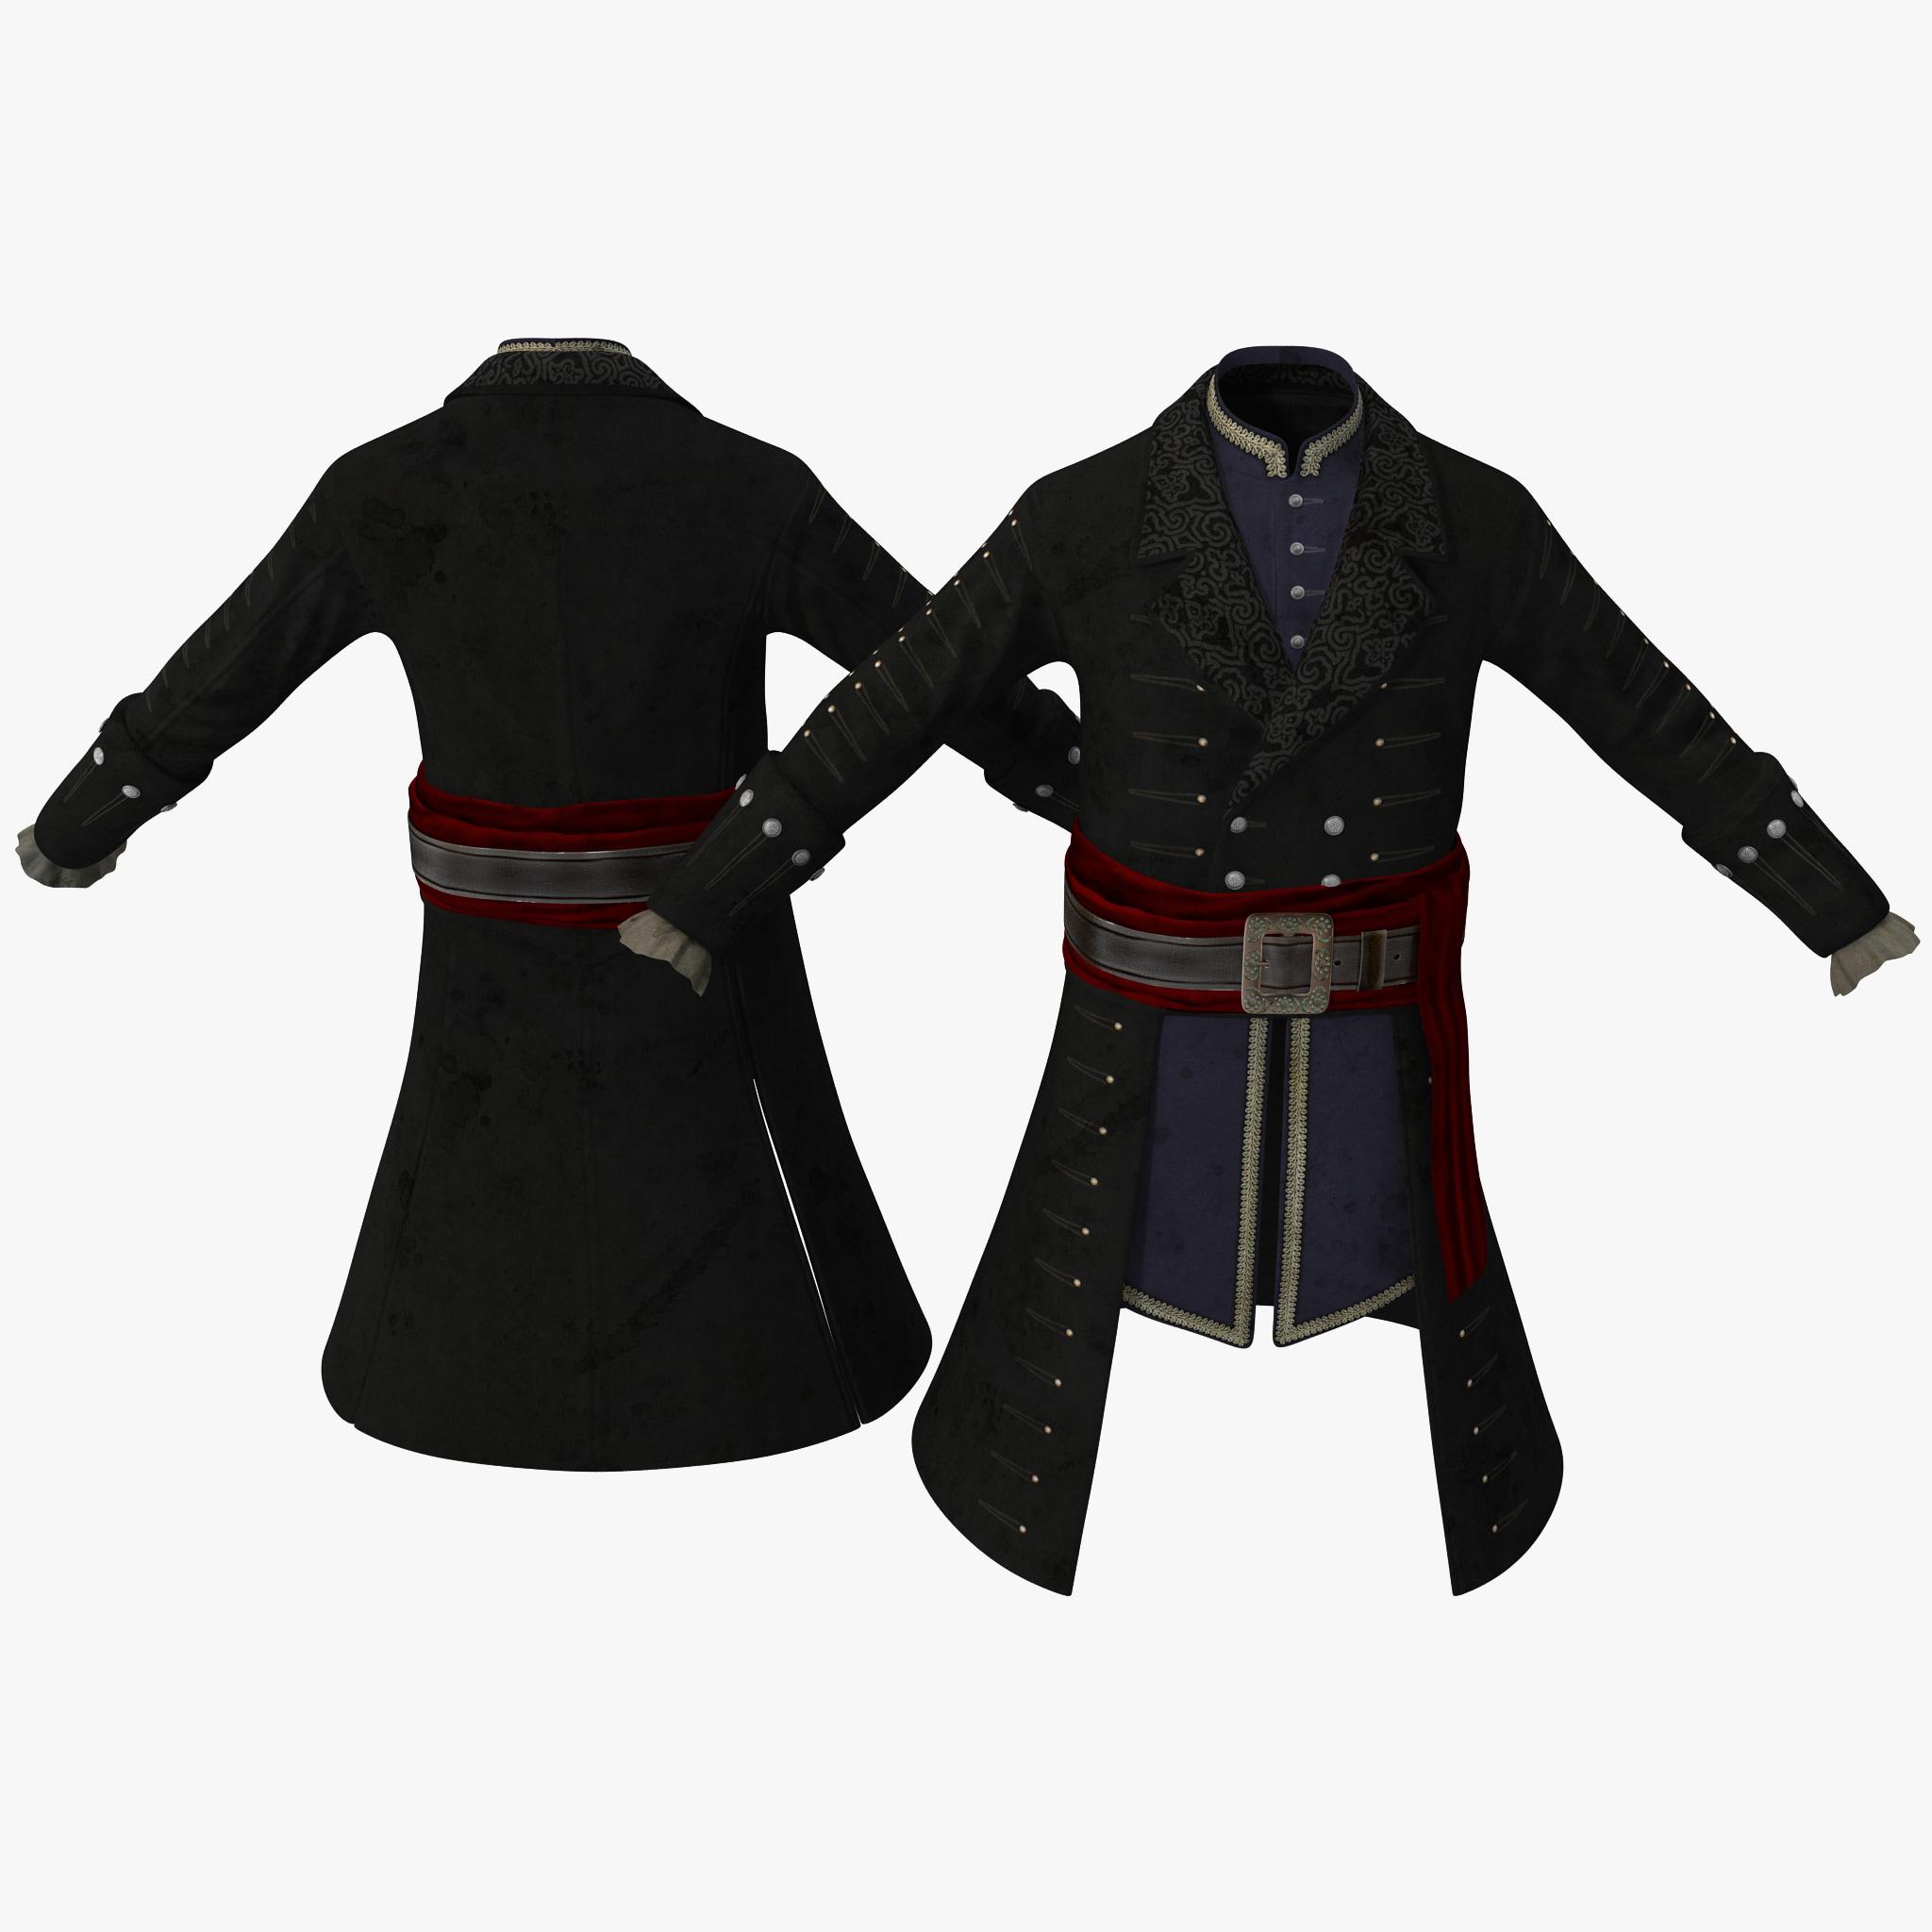 Pirate Costume 3